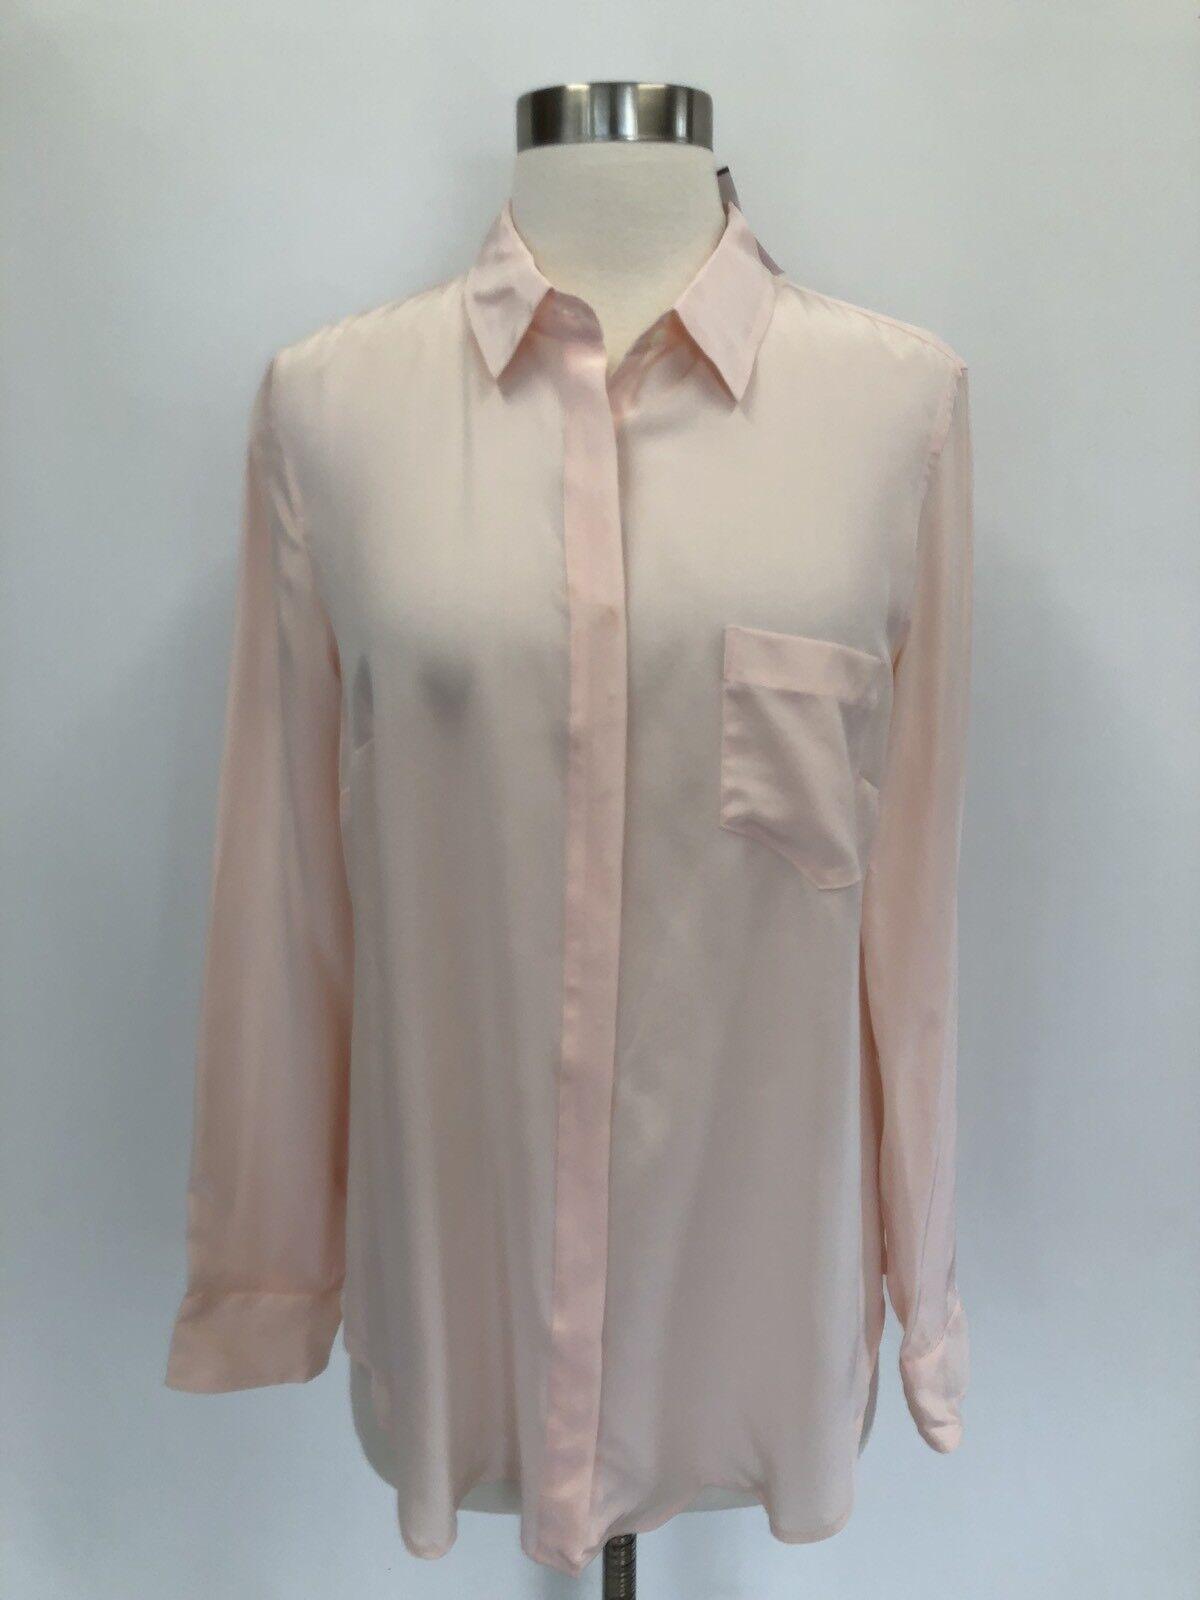 New J.Crew Silk Button Up Shirt Top Blouse Subtle Rosa Größe 8 H6232